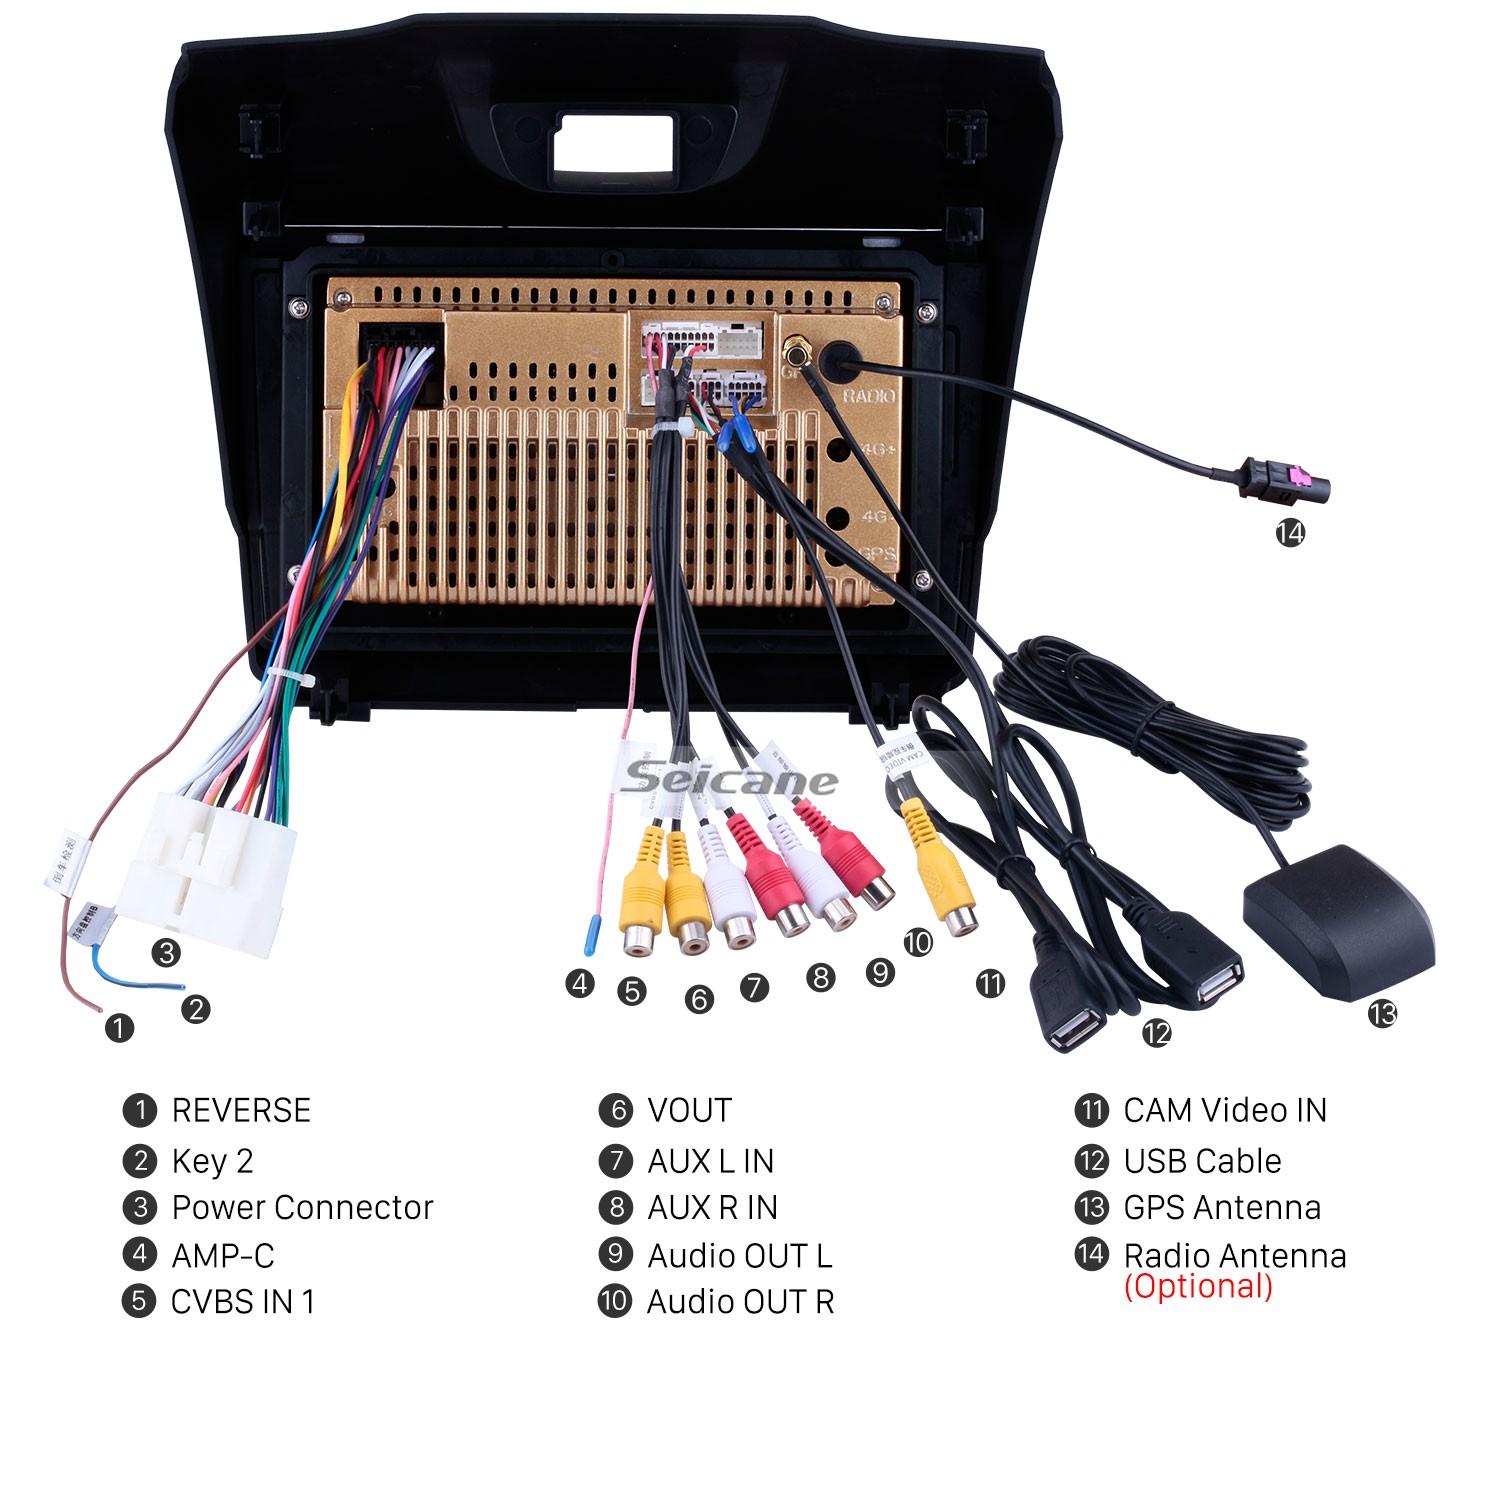 VZ_1076] Backup Camera Wiring Diagram For 07 Acura Mdx Download Diagram | Acura Mdx Backup Camera Wiring Diagram |  | Plan Lopla Osoph Scoba Mohammedshrine Librar Wiring 101